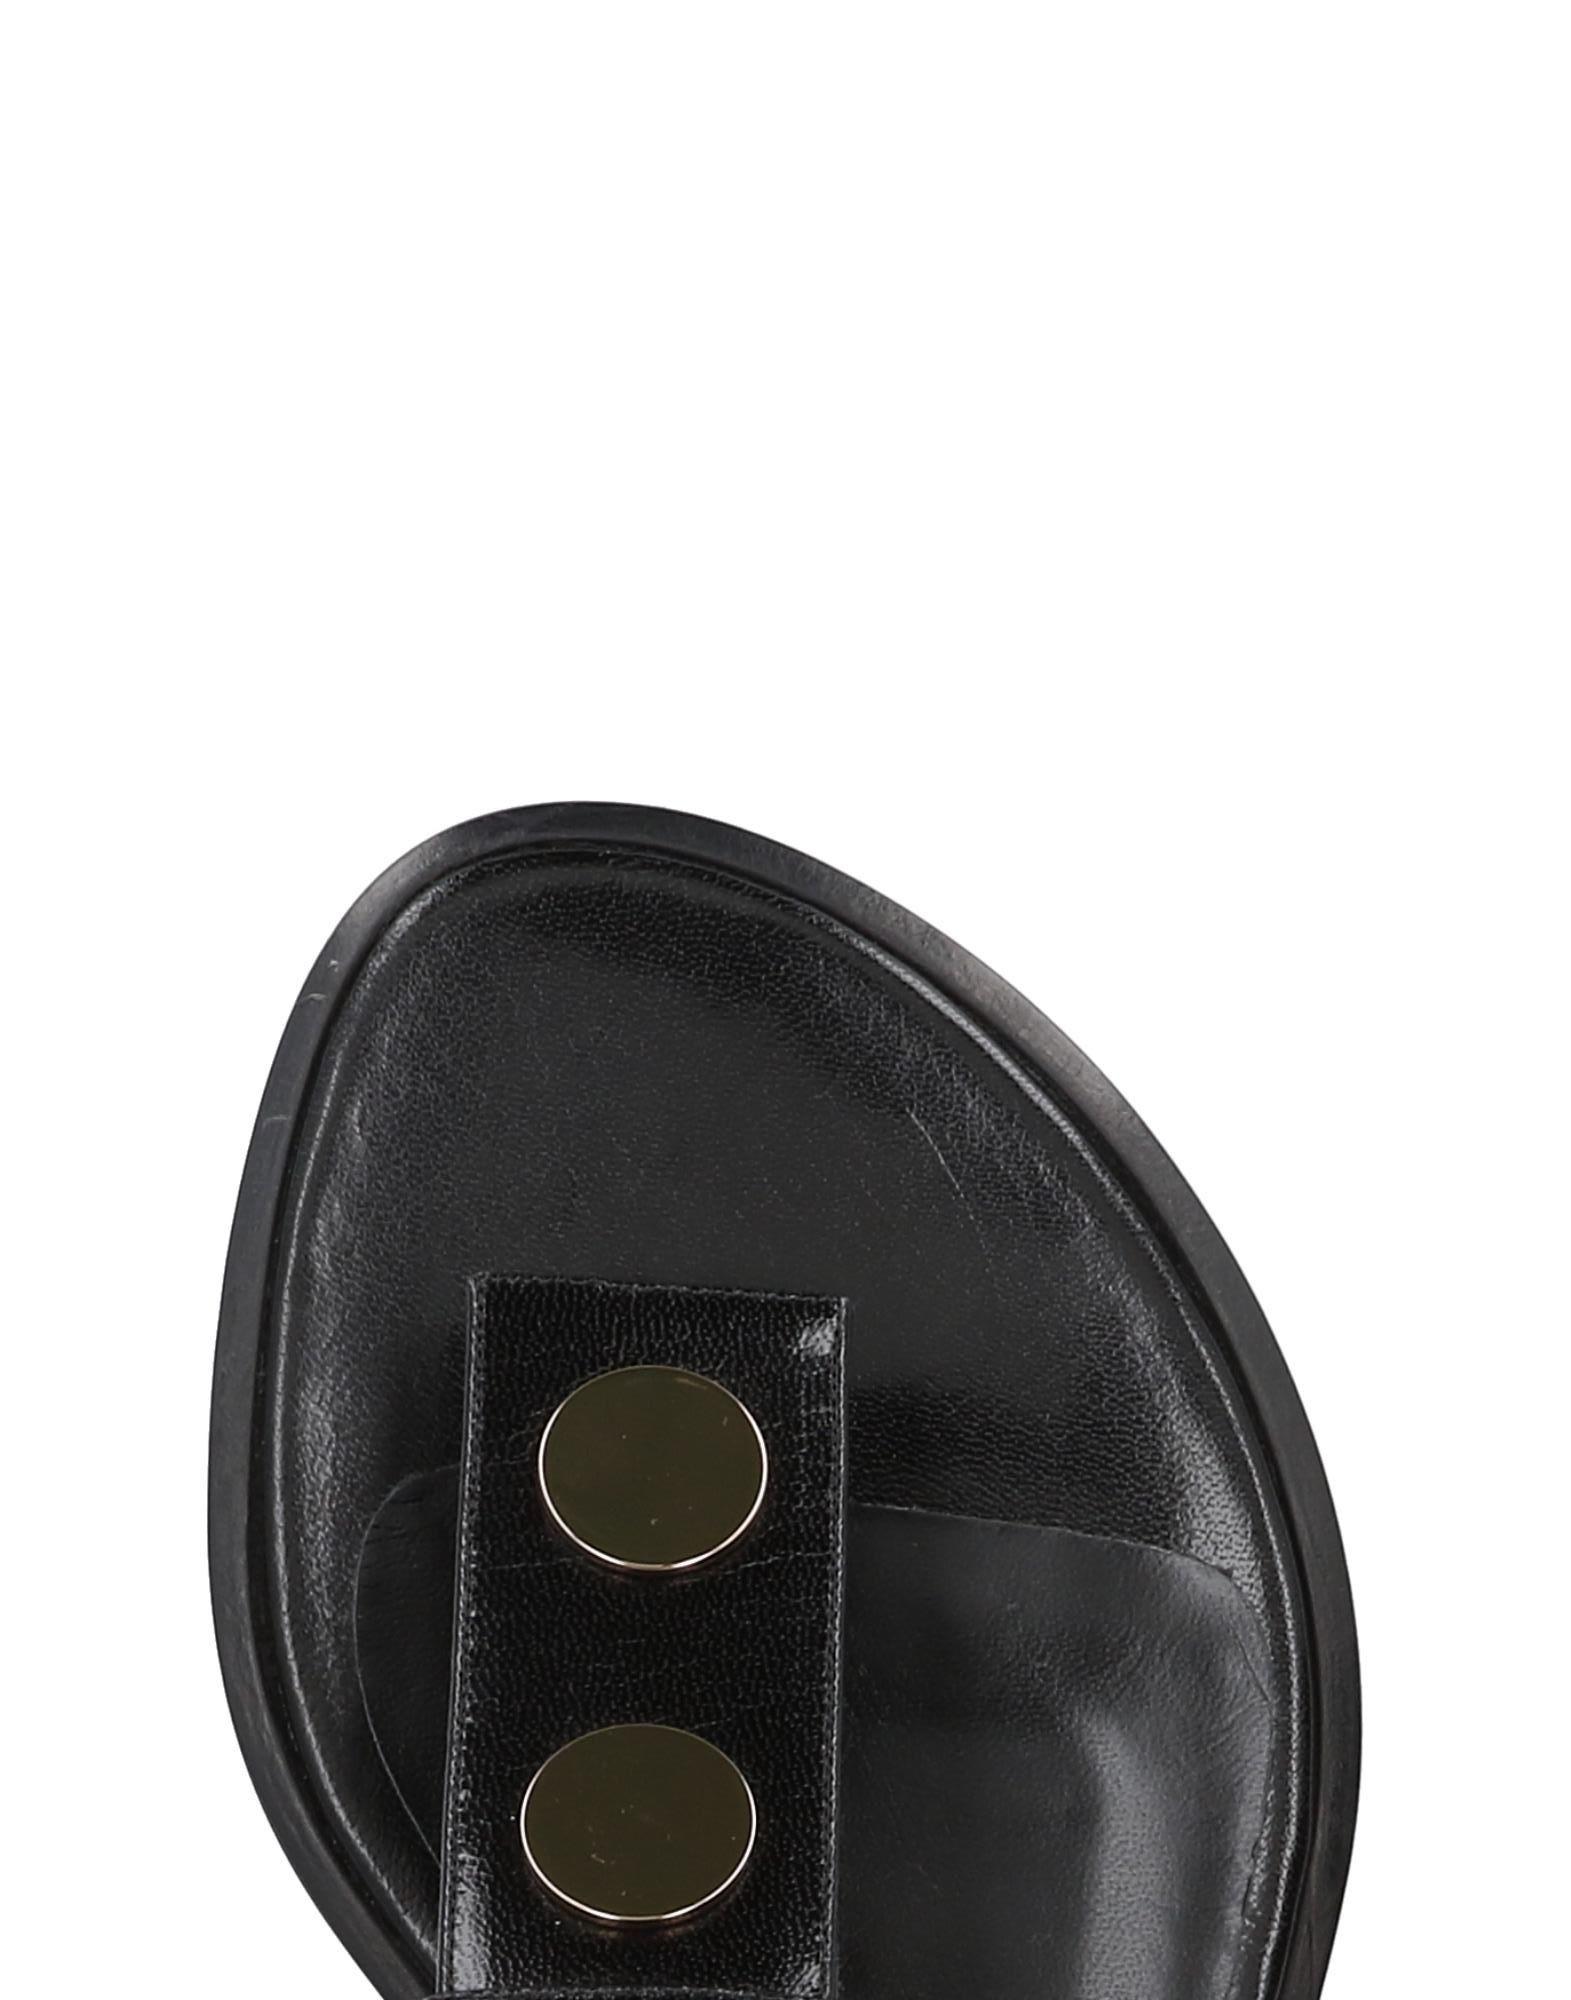 Pierre Hardy Dianetten Damen  11431882RDGut aussehende aussehende aussehende strapazierfähige Schuhe 8df674